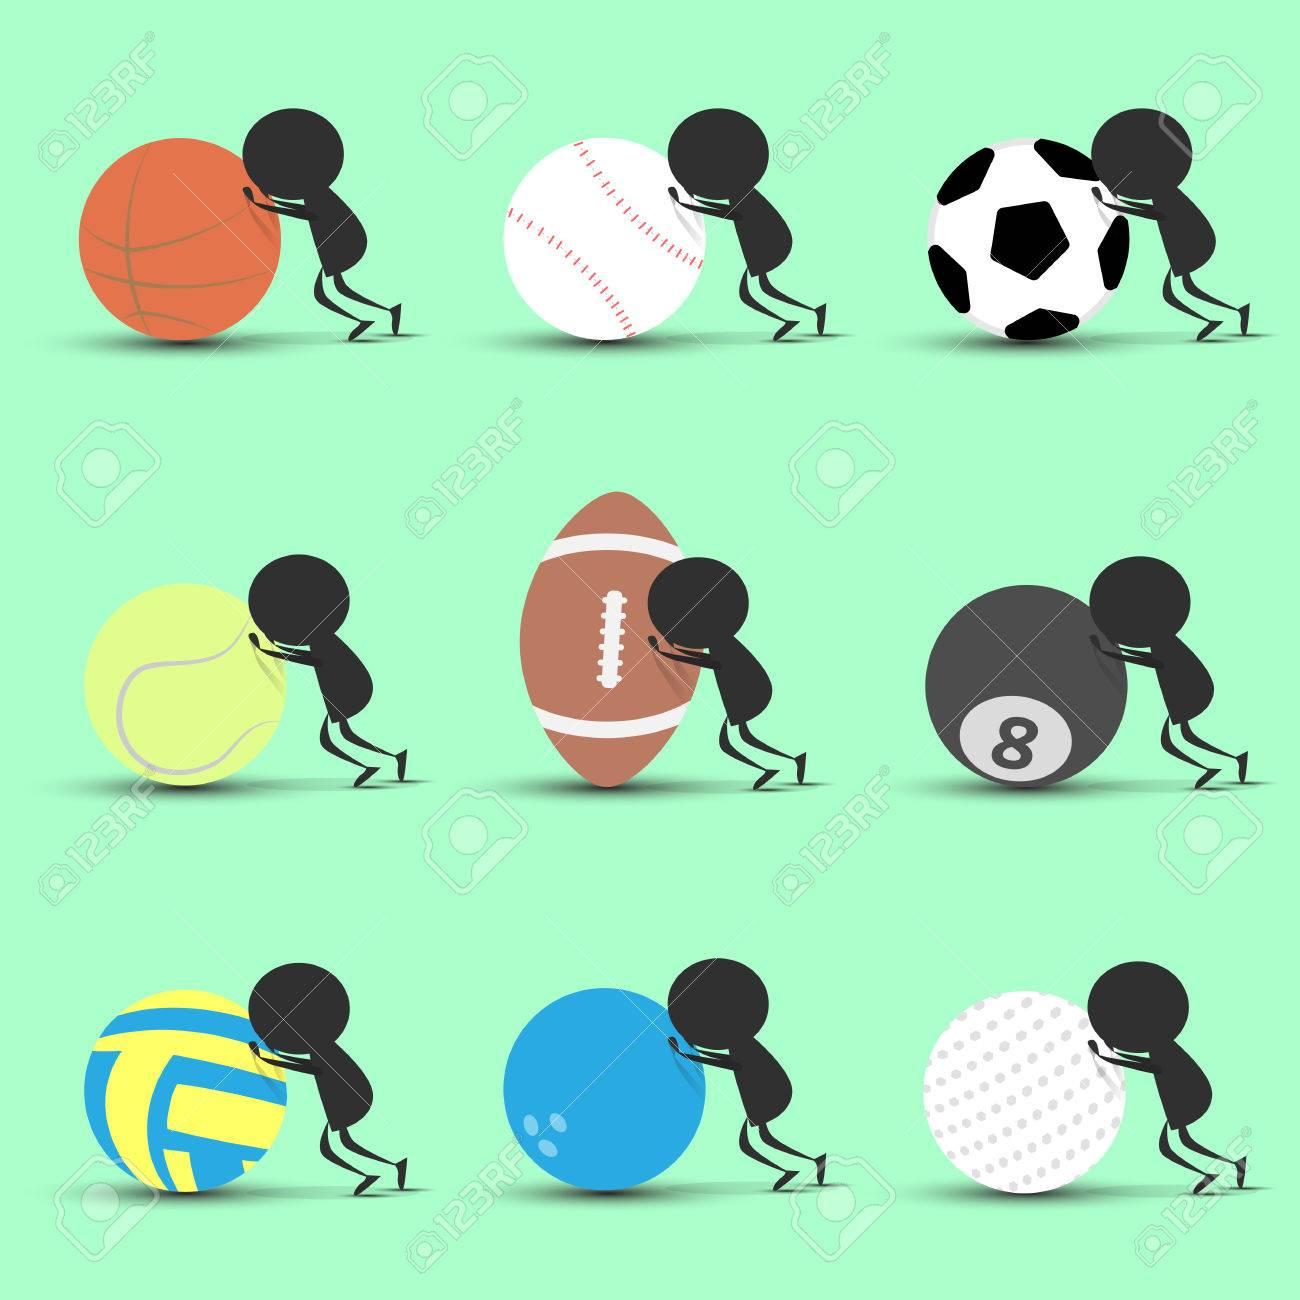 Black man character cartoon push sports ball forward with green background. Flat graphic. logo design. sports cartoon. sports balls .vector. illustration. - 78424319